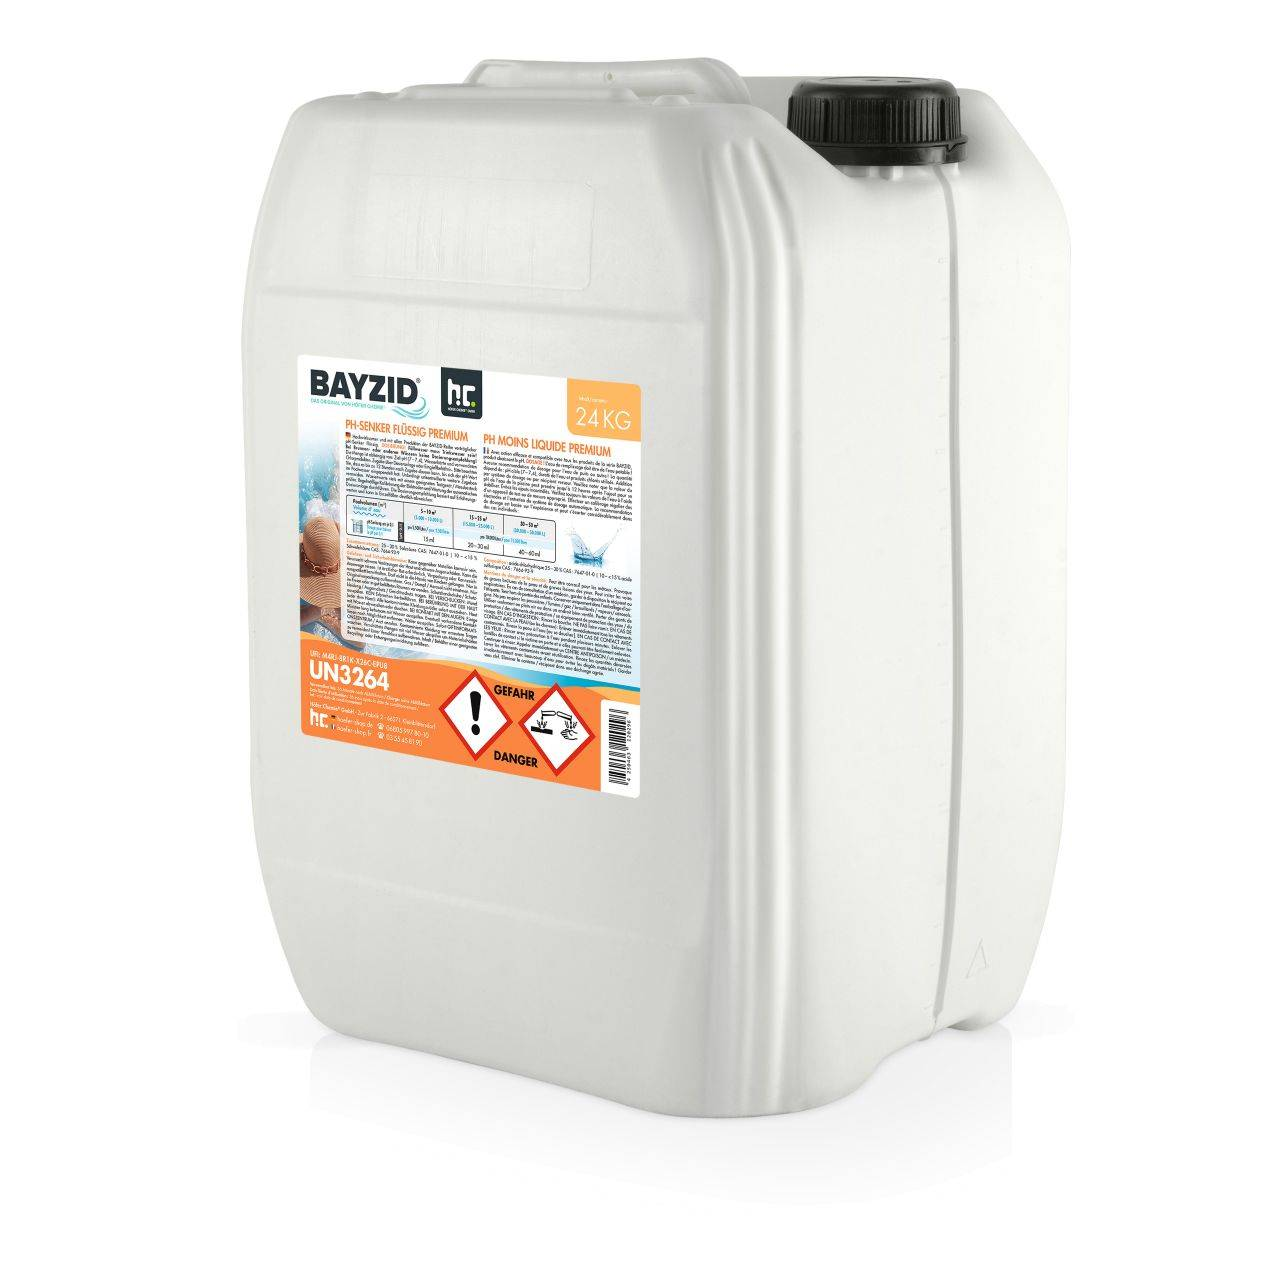 BAYZID 24 kg Bayzid® pH moins liquide (1 x 24 kg)